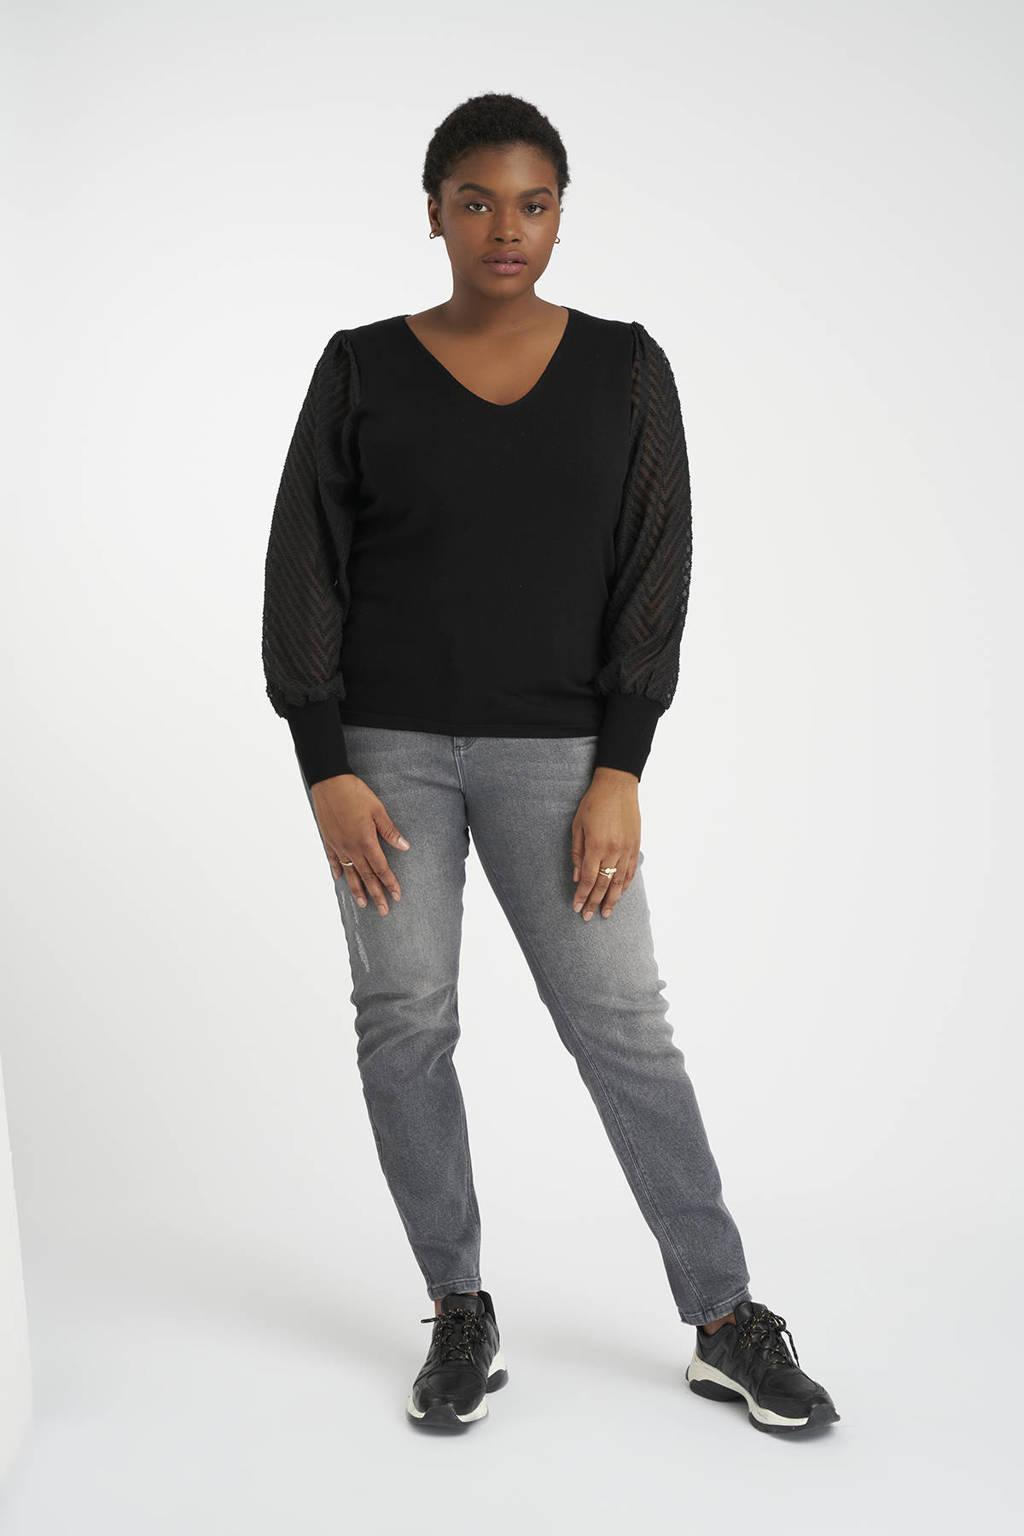 MS Mode semi-transparante trui met textuur zwart, Zwart